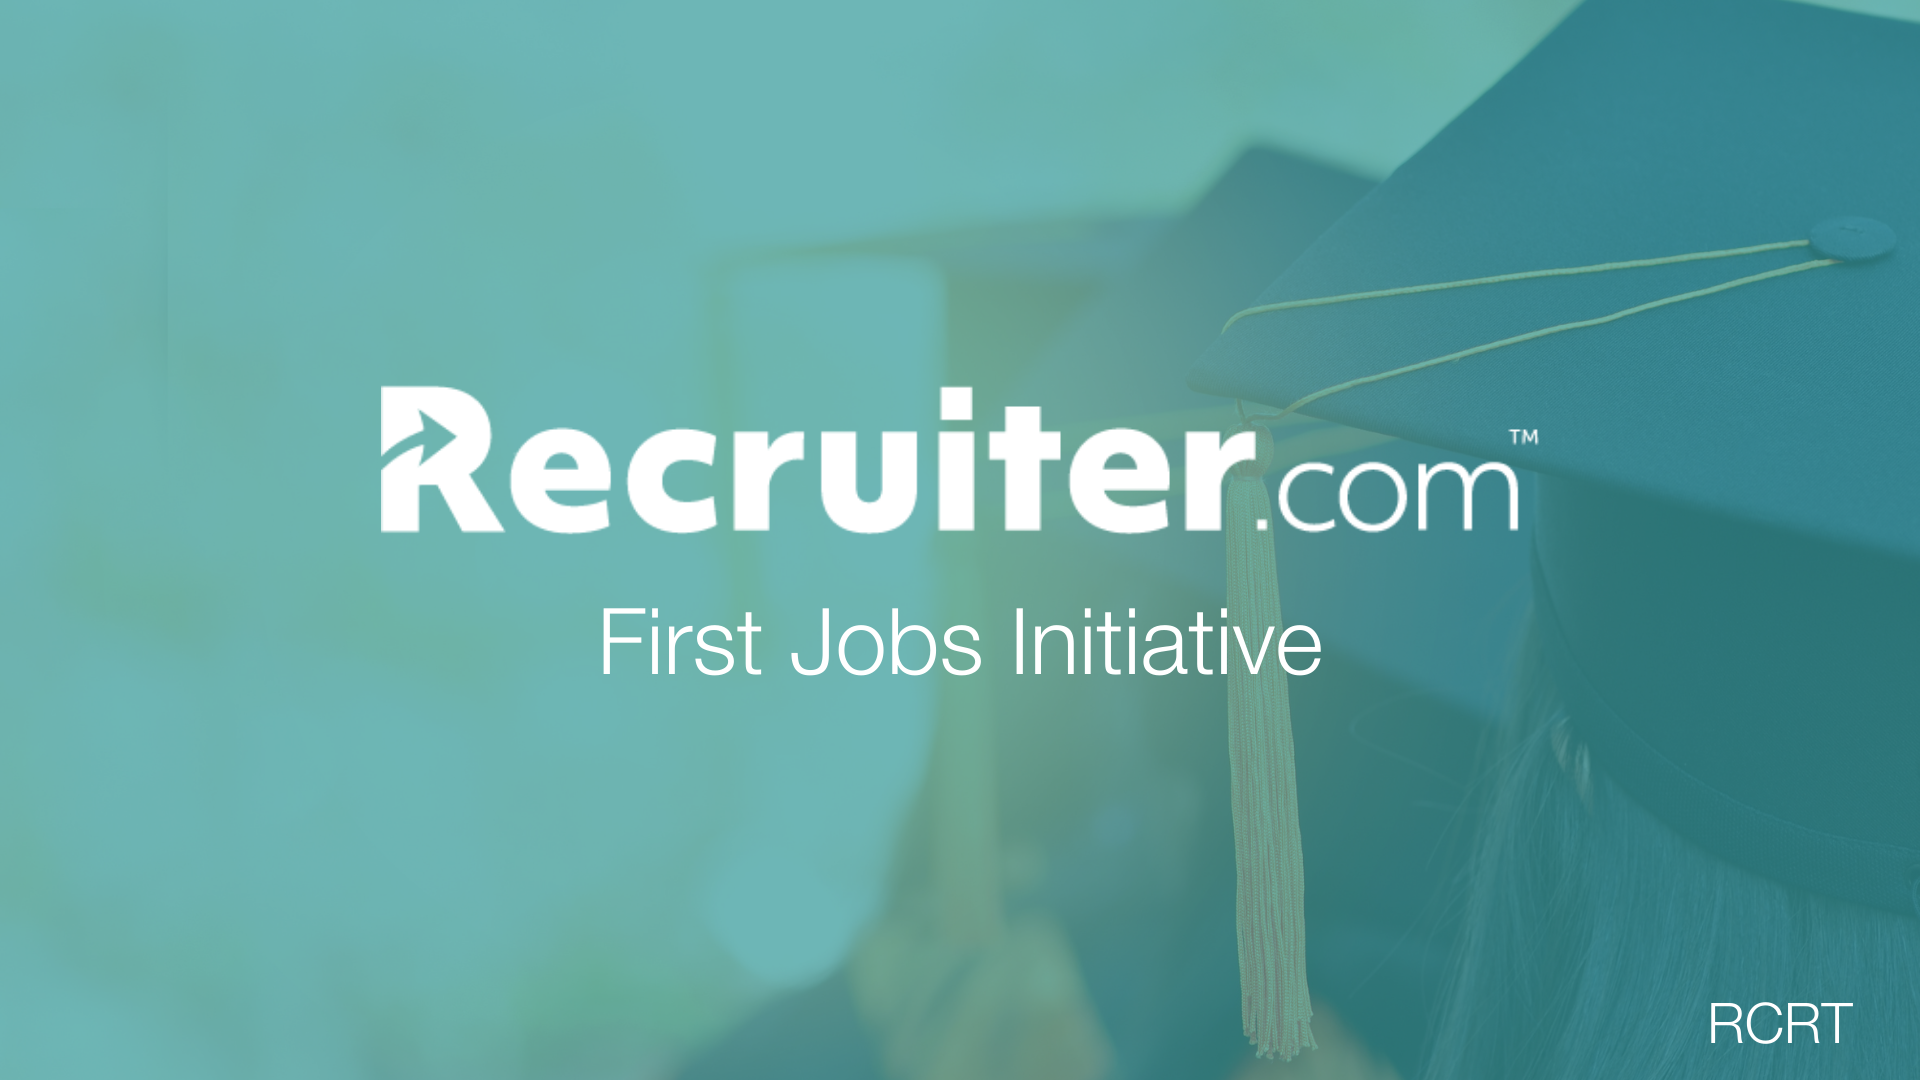 First Jobs Initiative